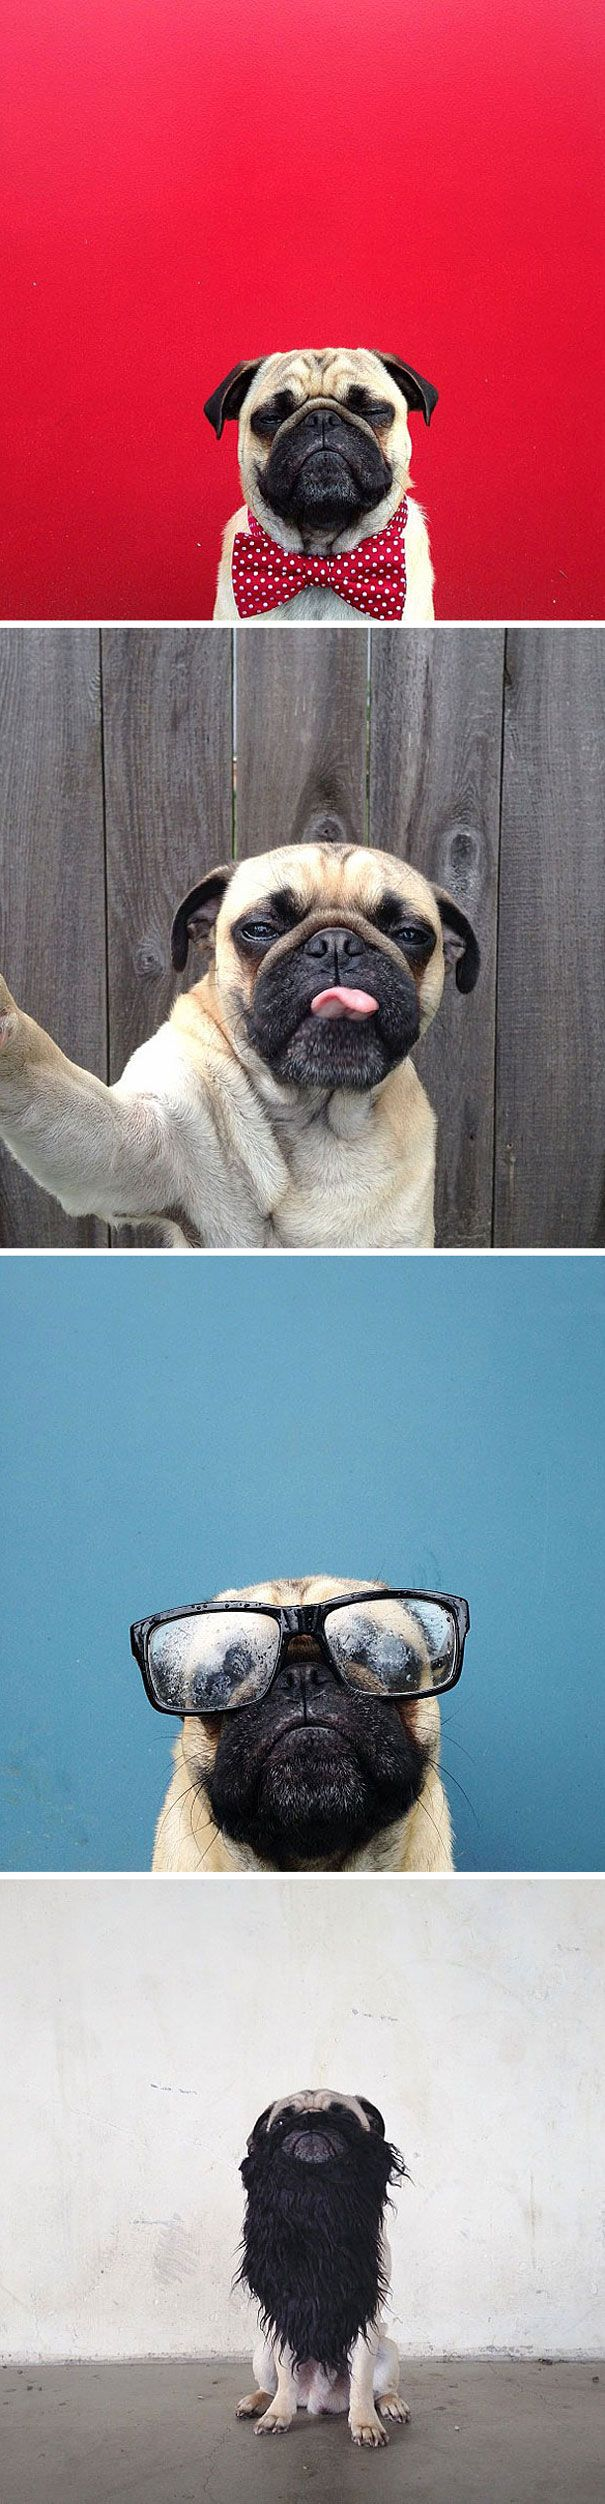 norm-the-pug-dog-photography-adn